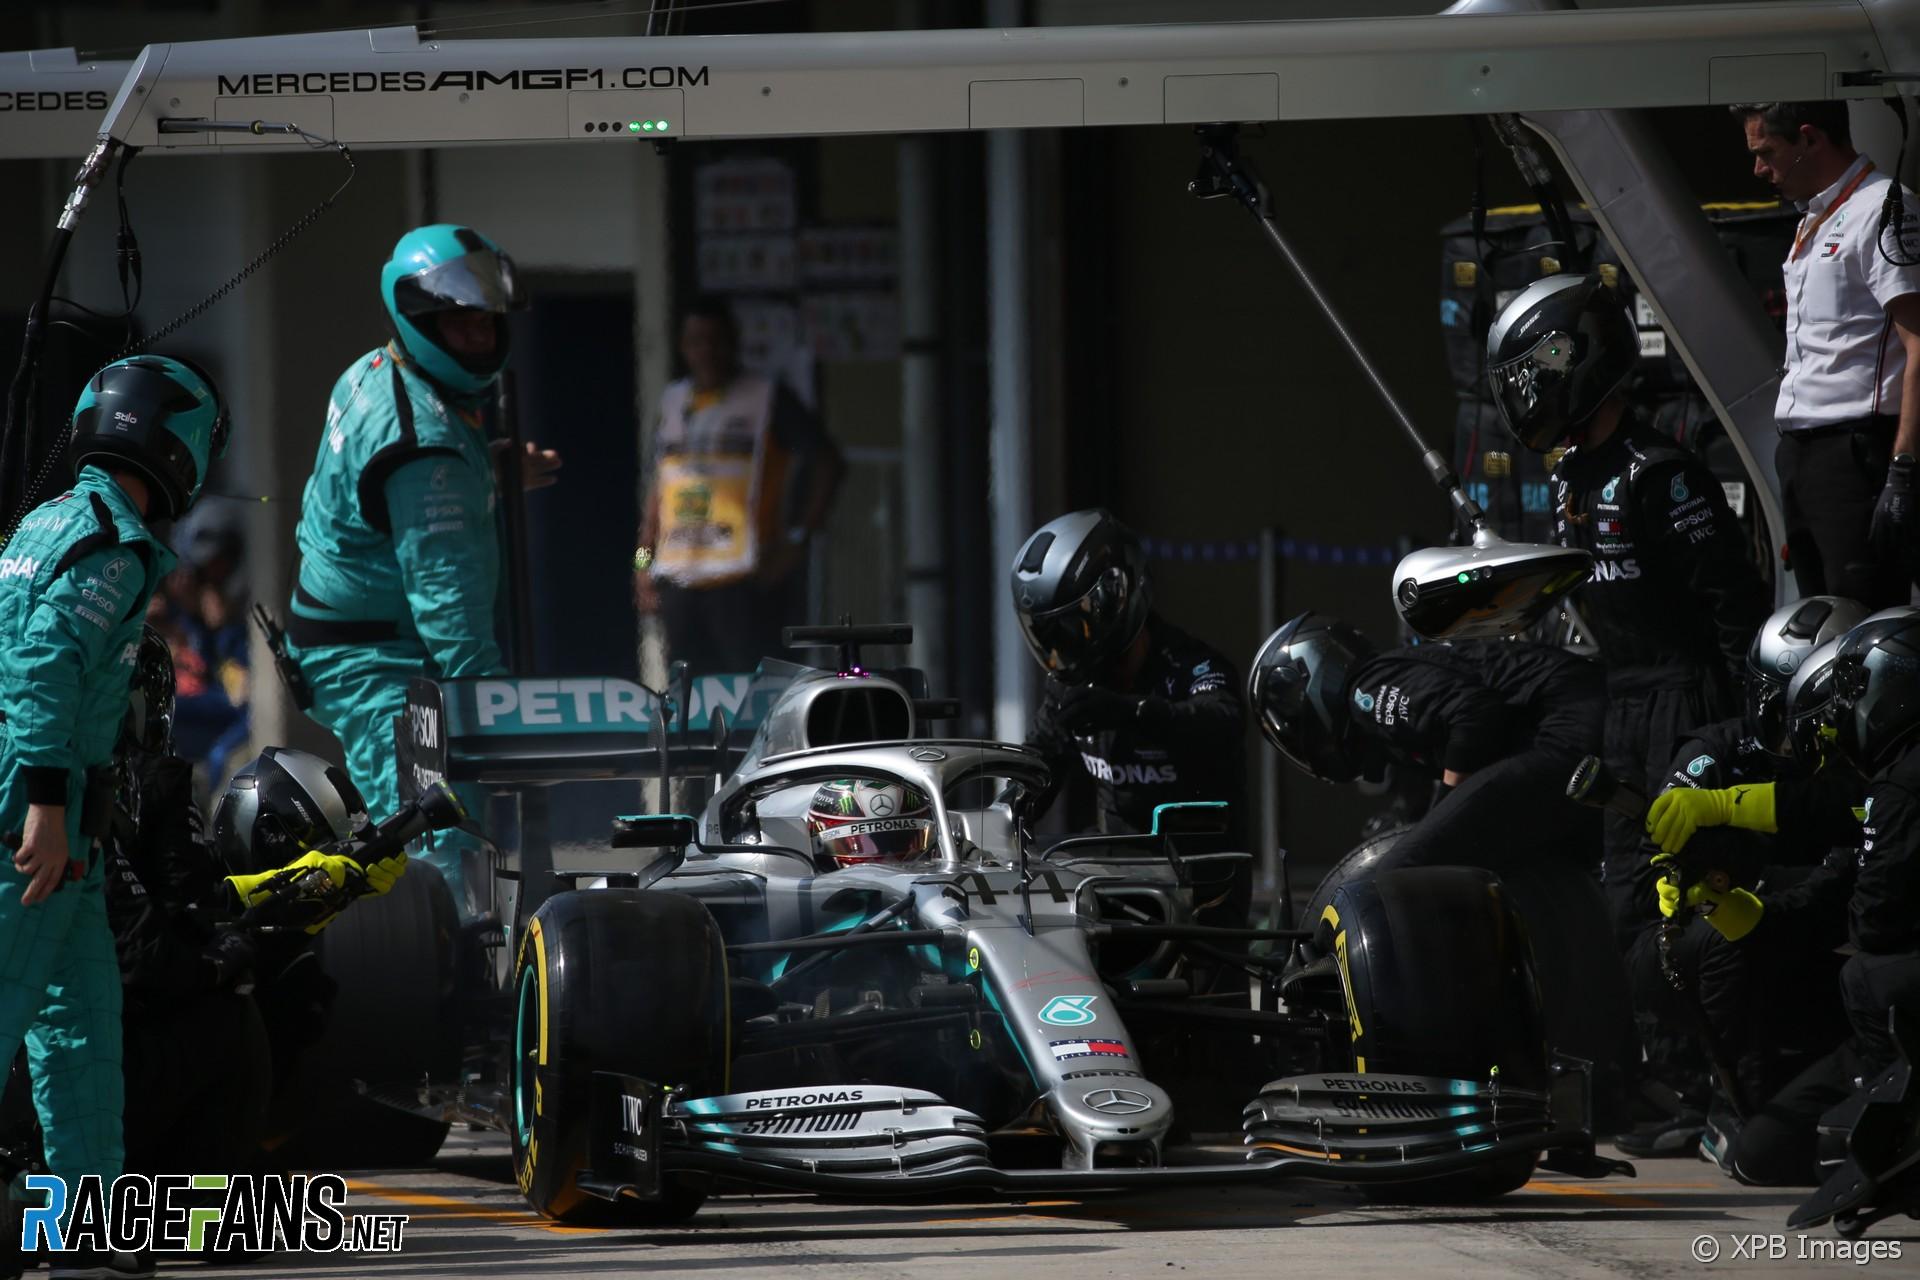 Lewis Hamilton, Mercedes, Interlagos, 2019